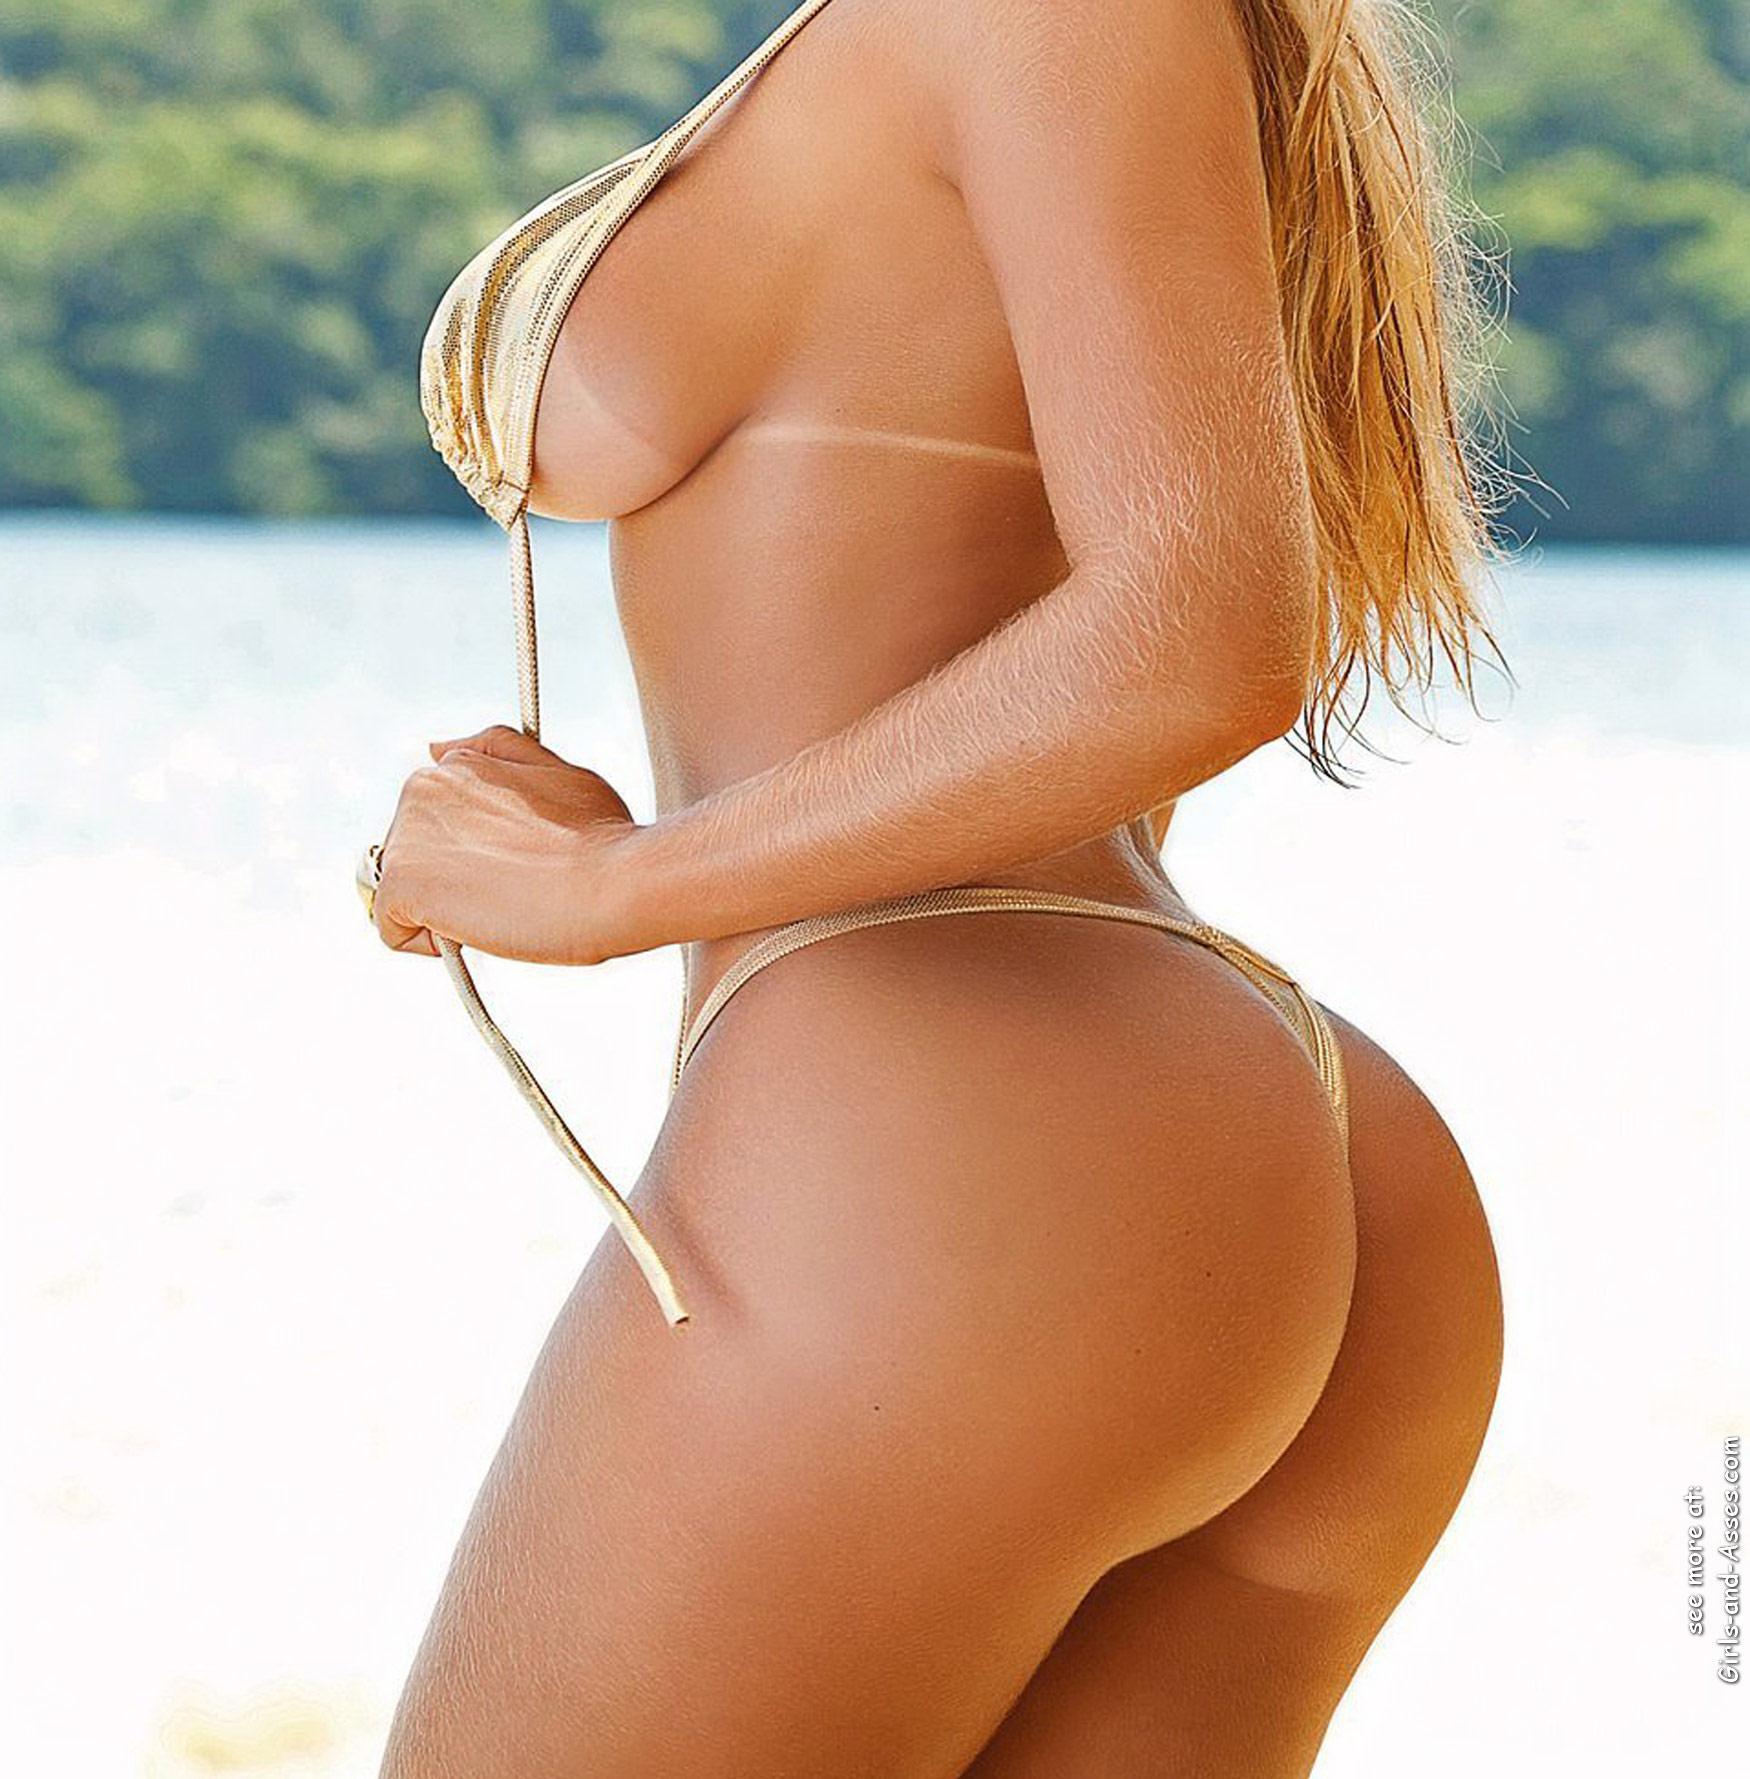 sexy palg on the beach image 00227